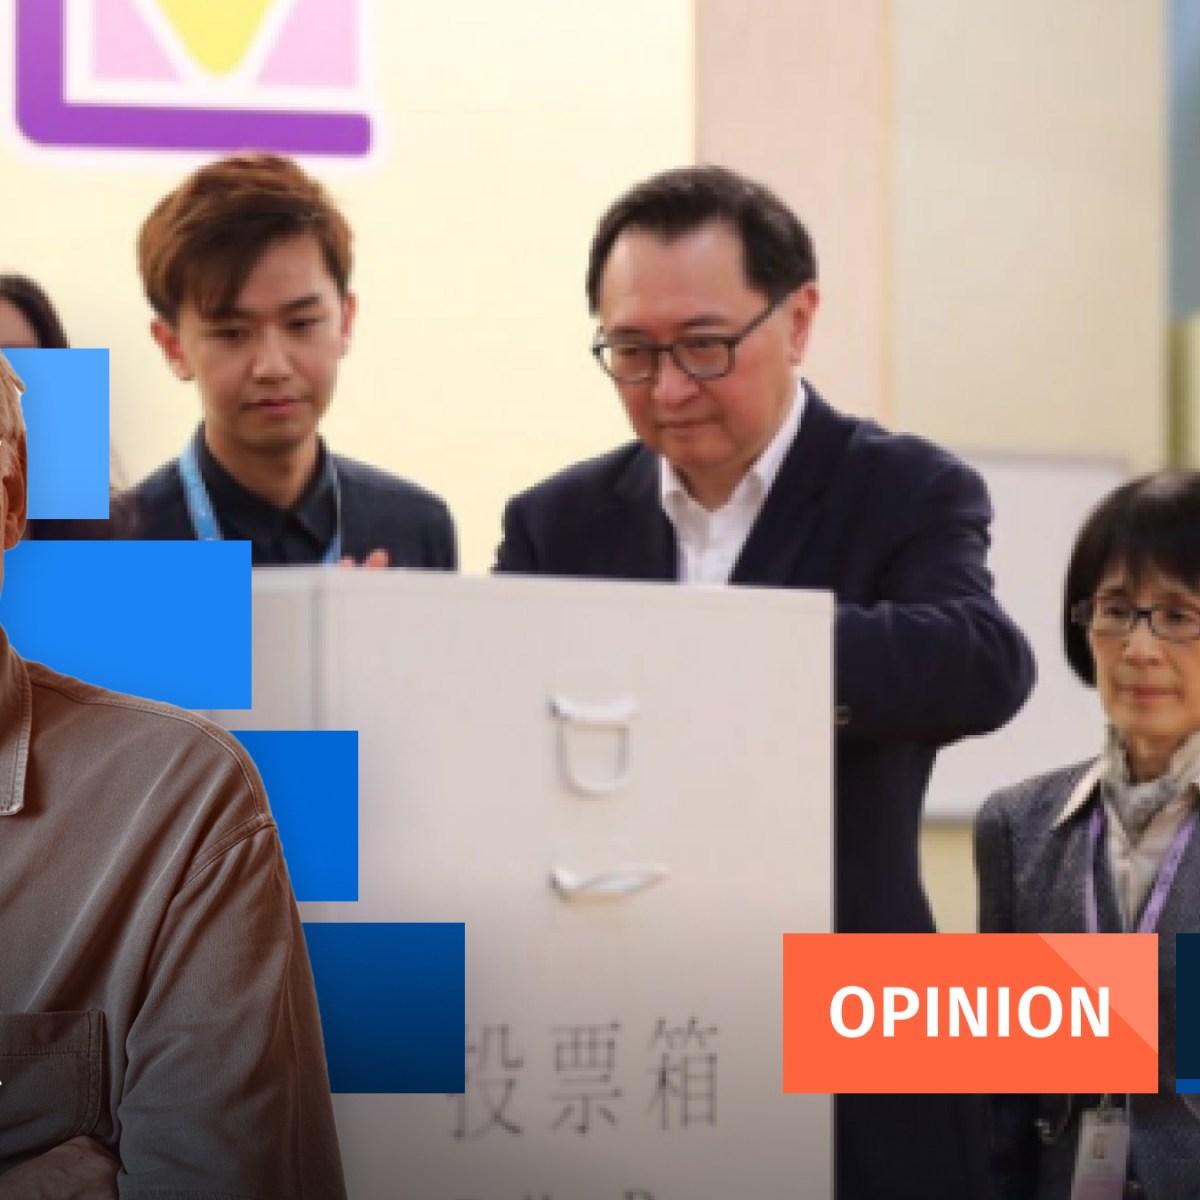 Article - elections - Tim Hamlett